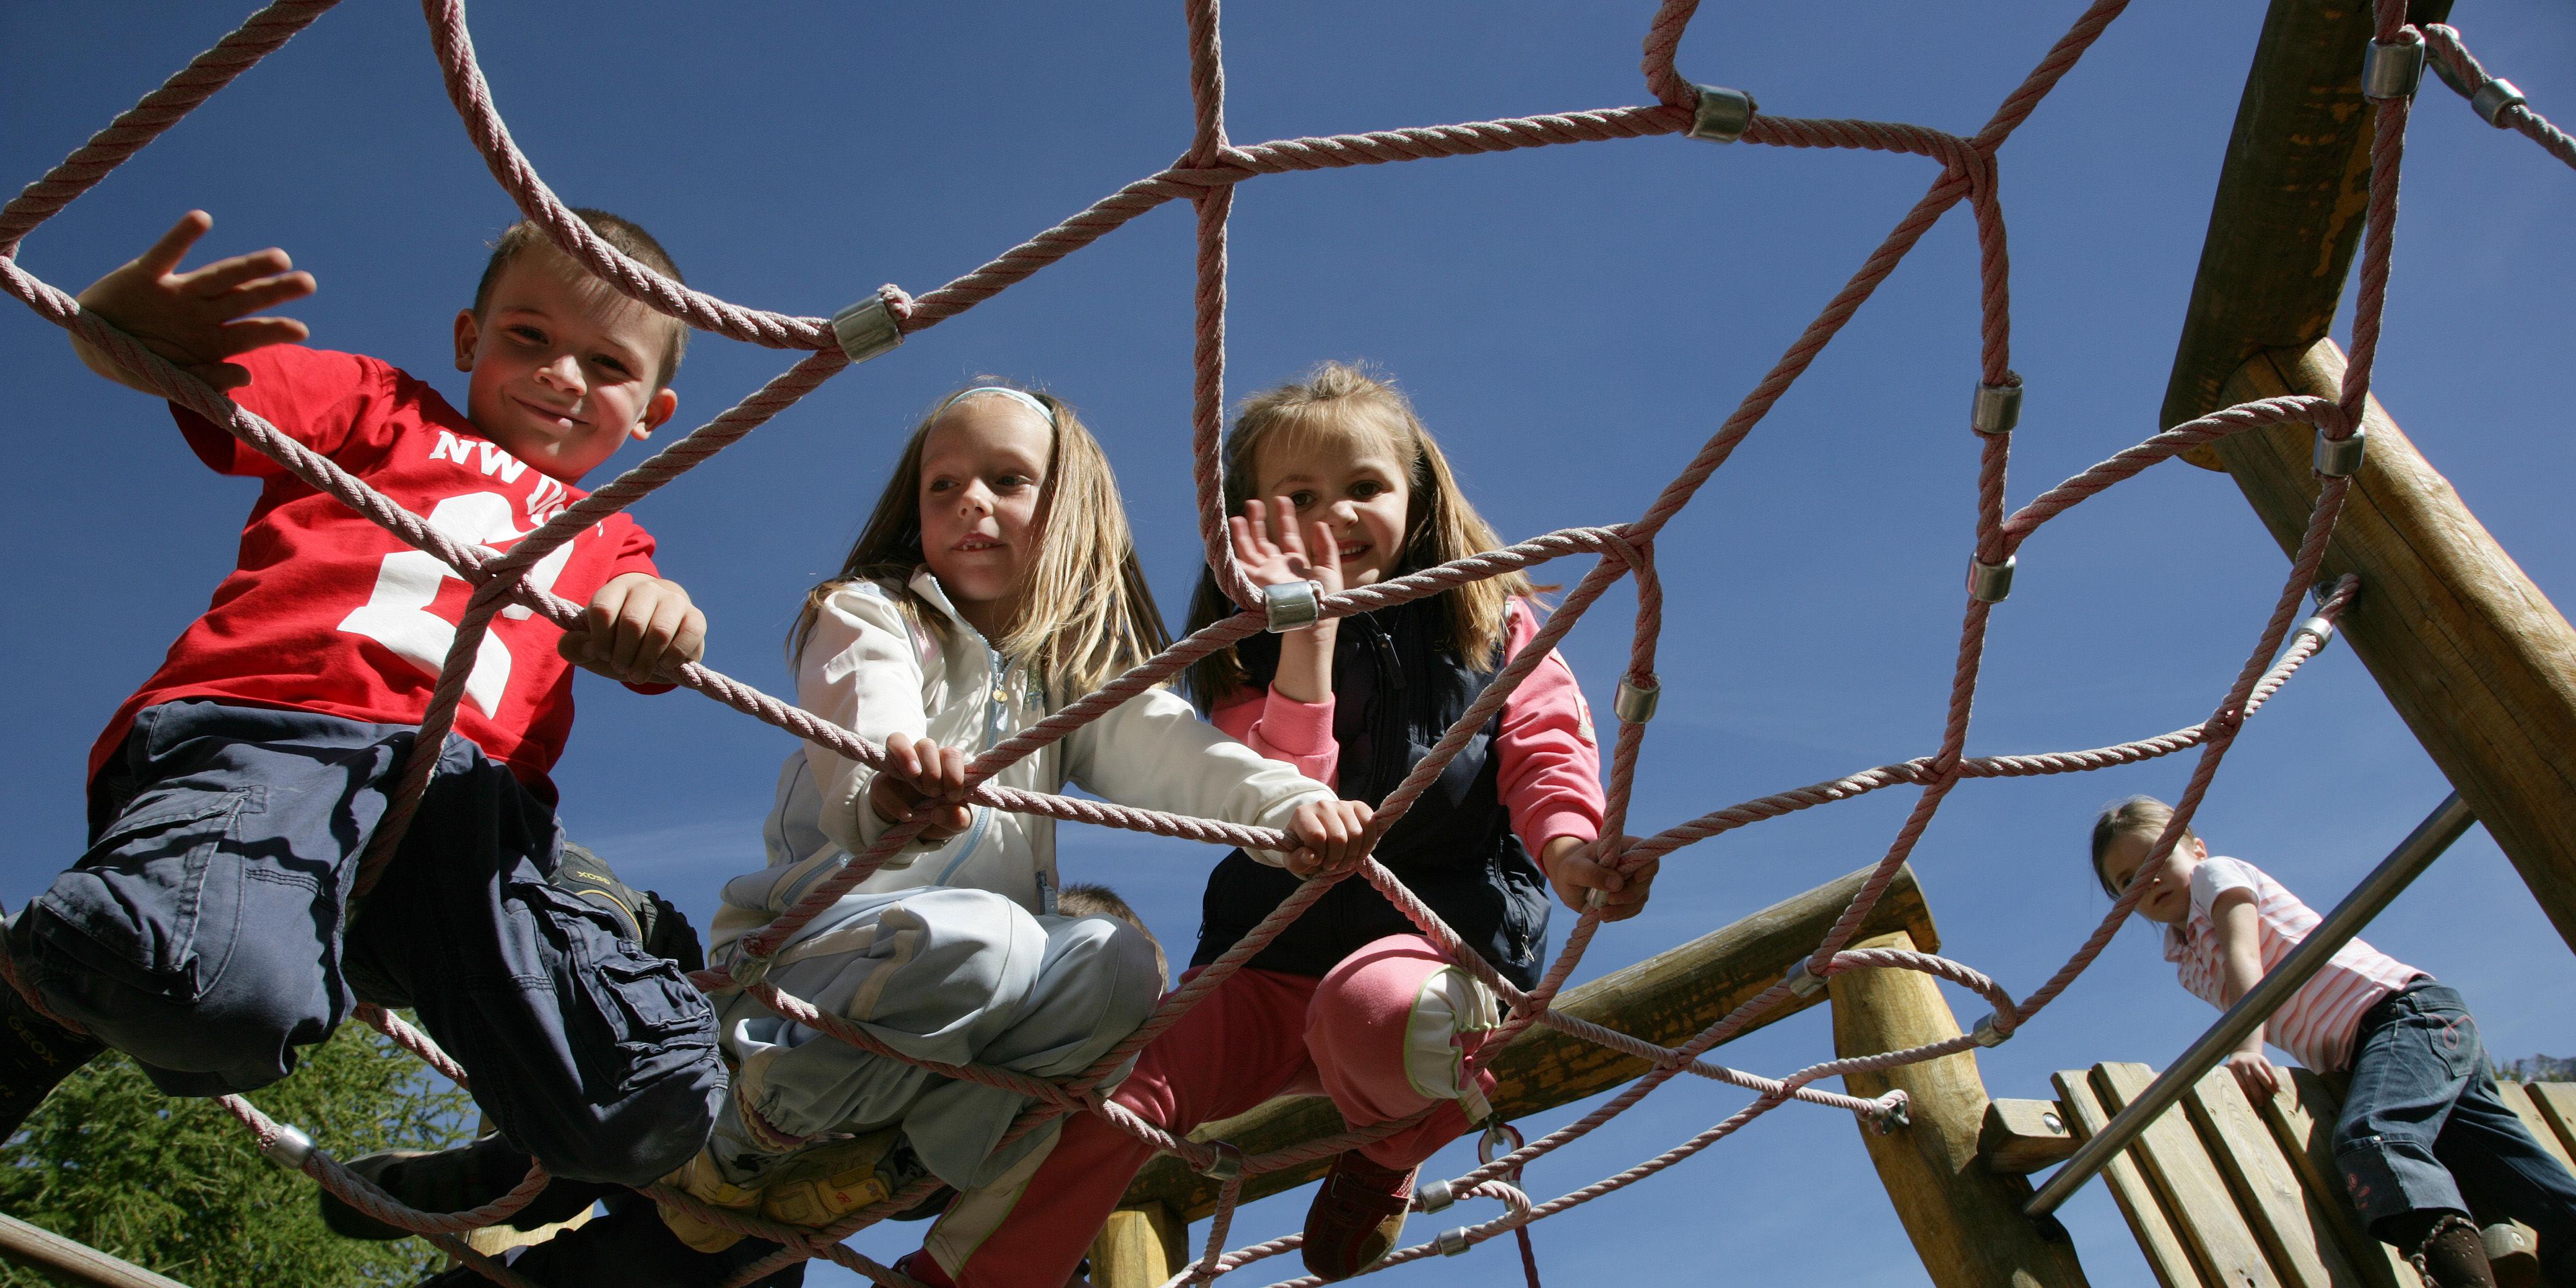 Activities for kids in Saas-Fee